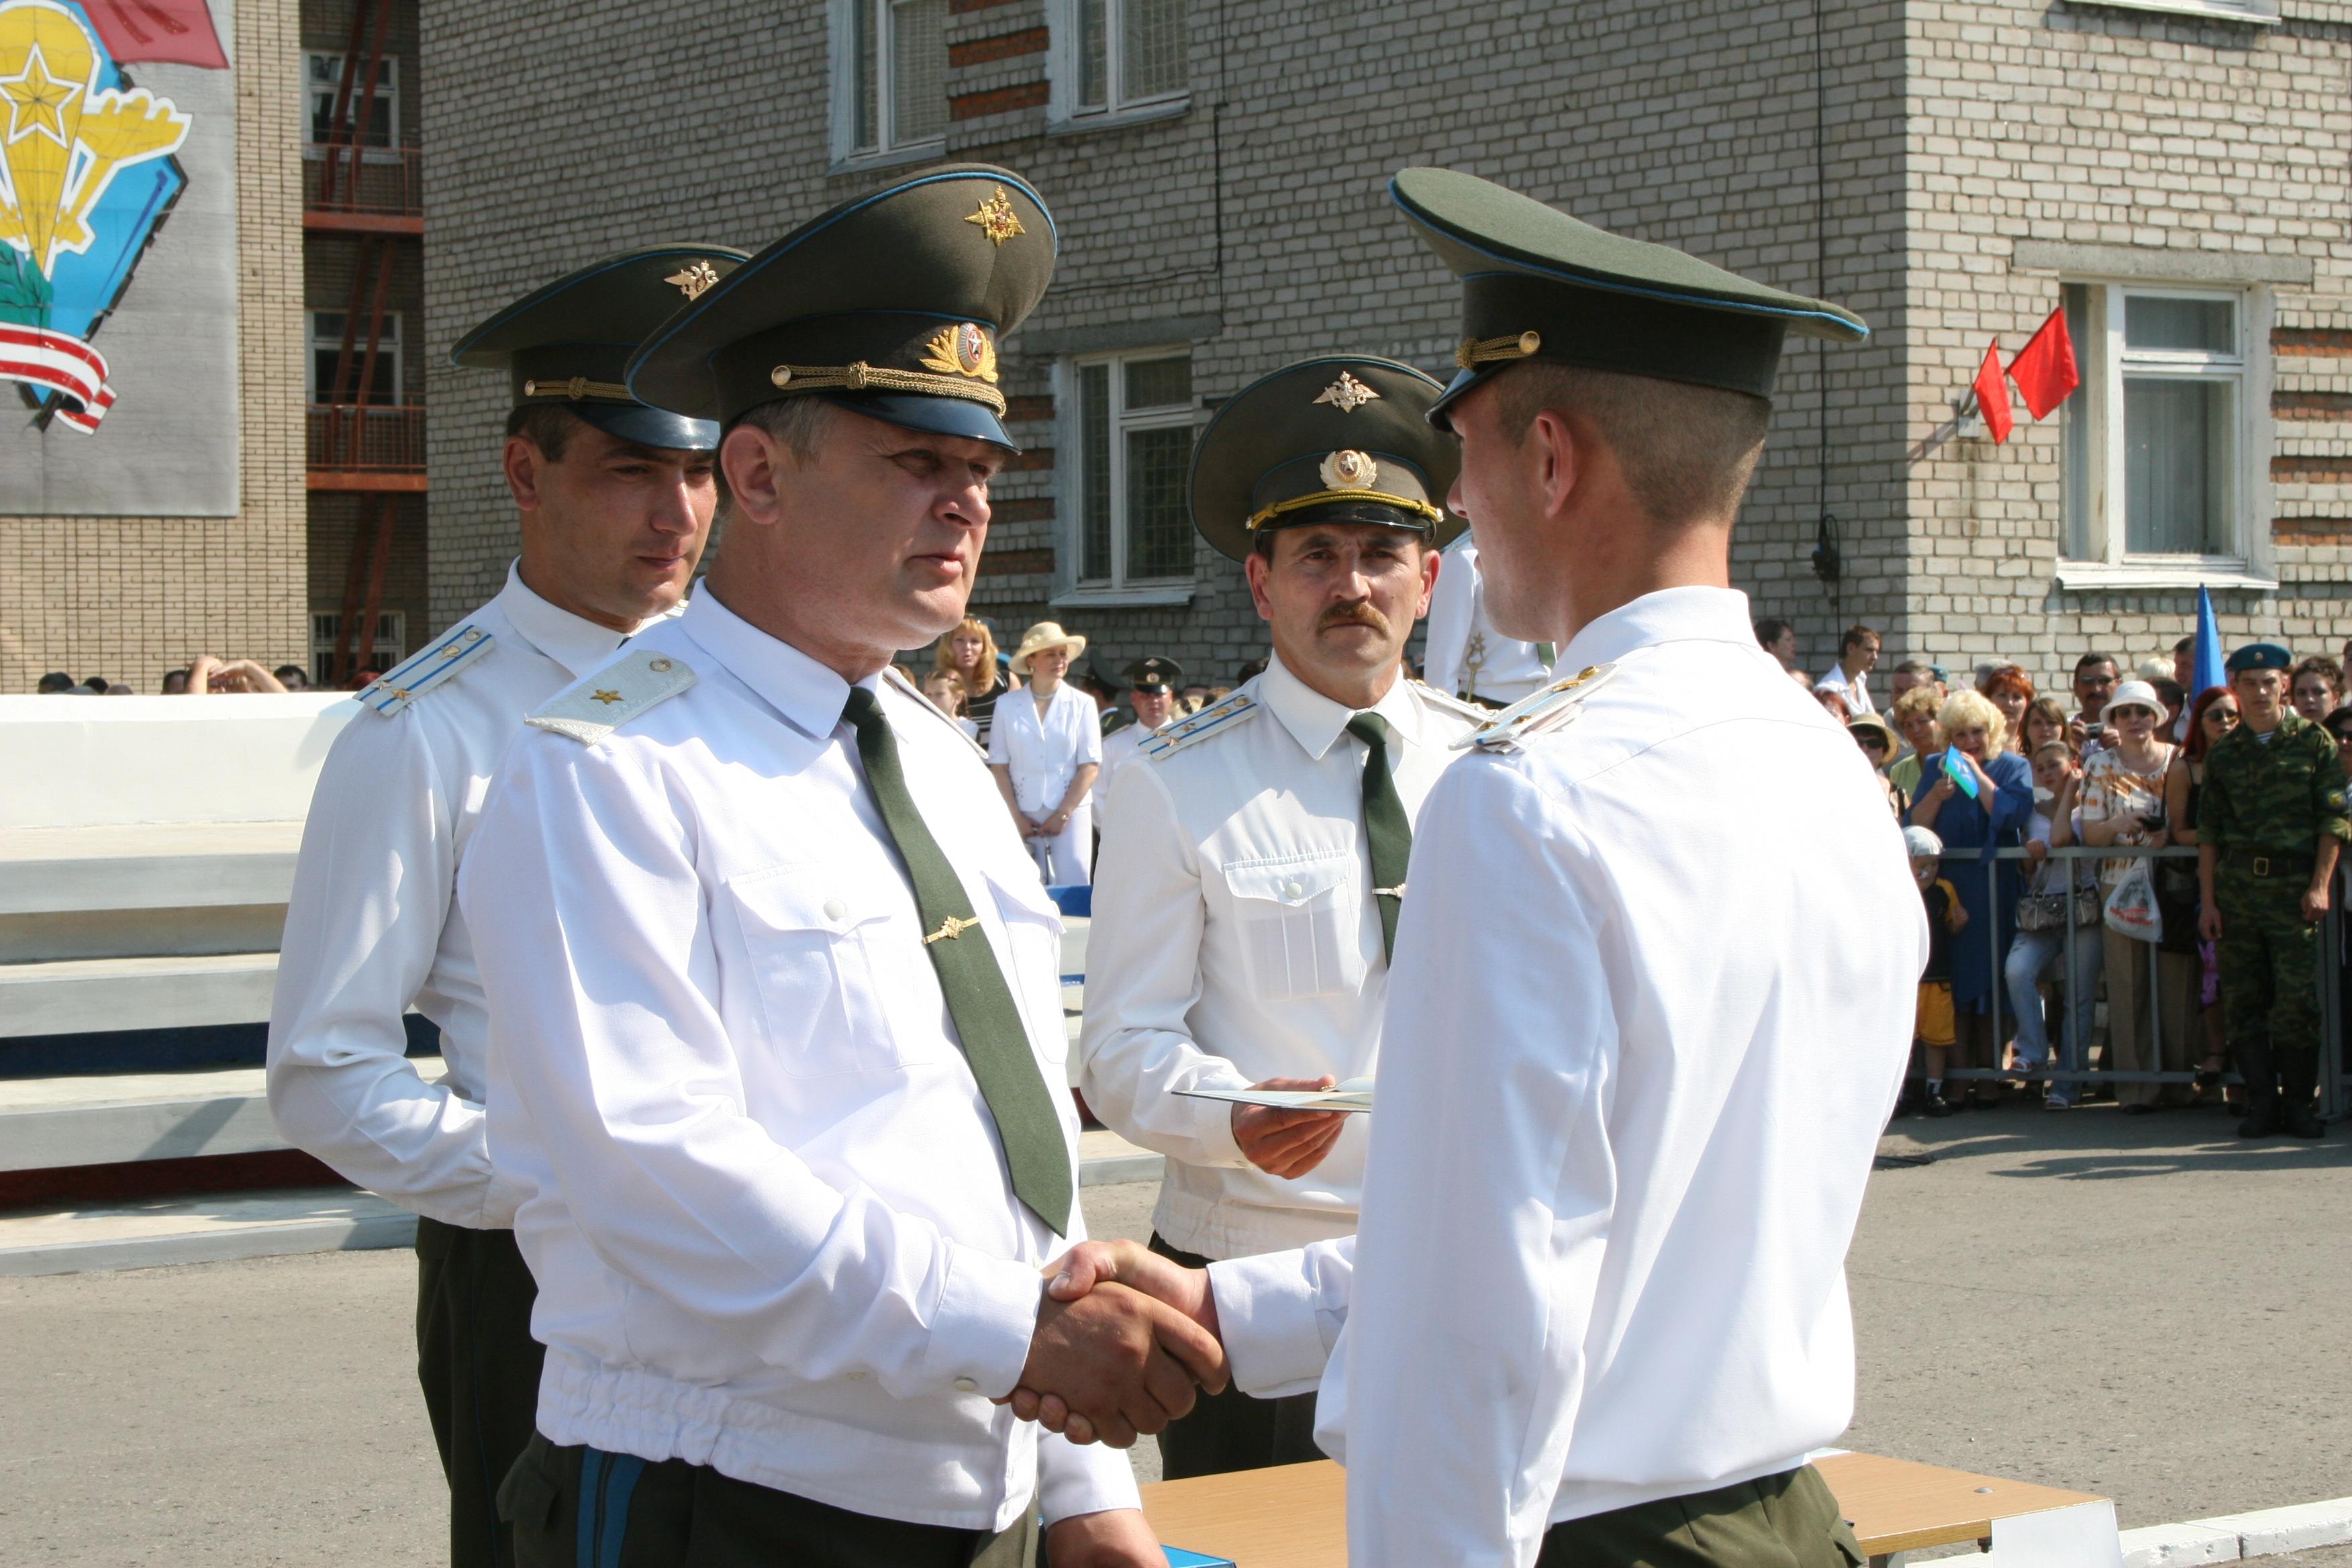 Admiterea aeriană a academiei militare Ryazan. Institutul Forțelor Aeriene Ryazan